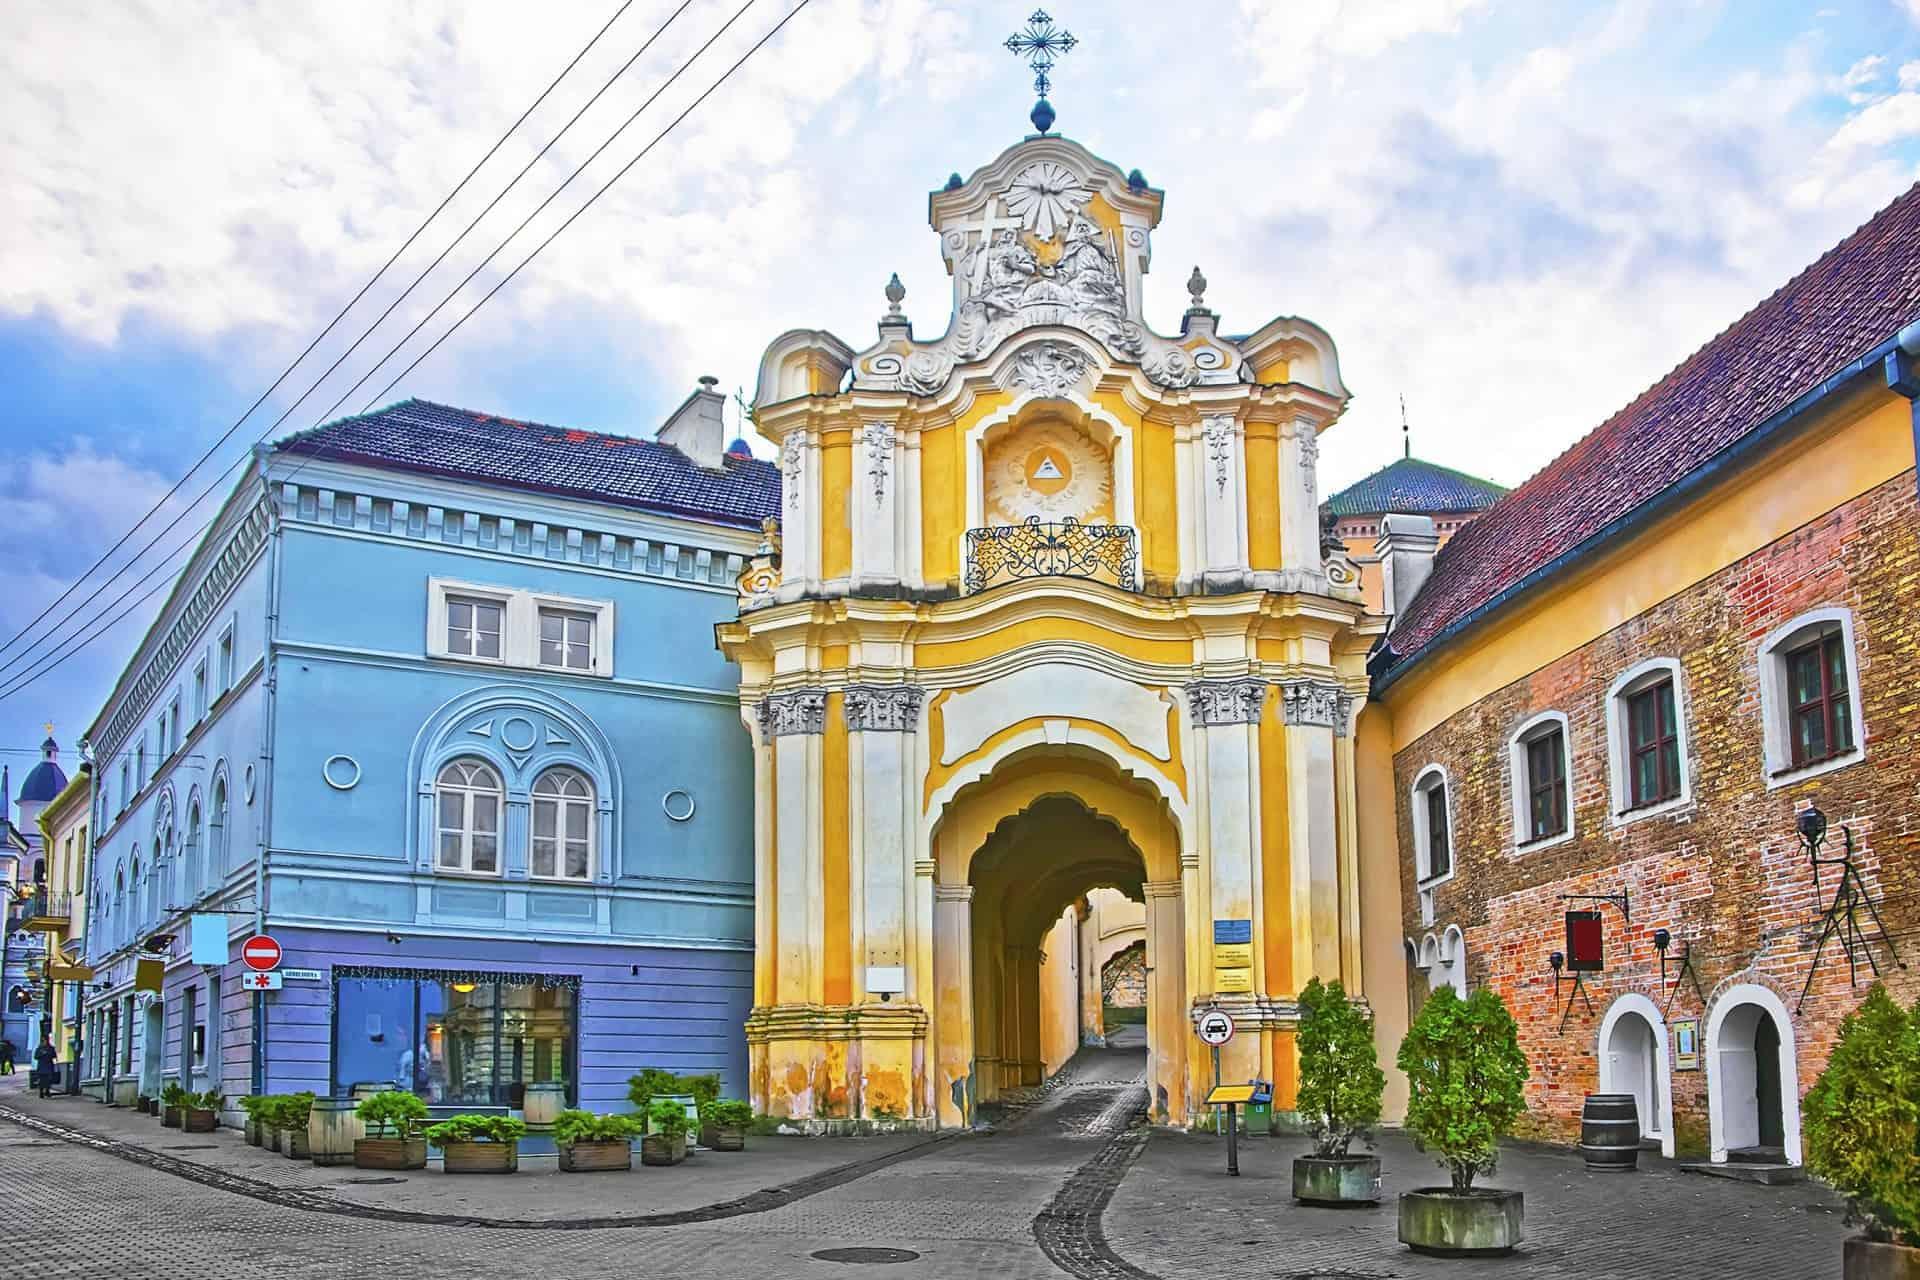 Architecture in Old Town, Vilnius